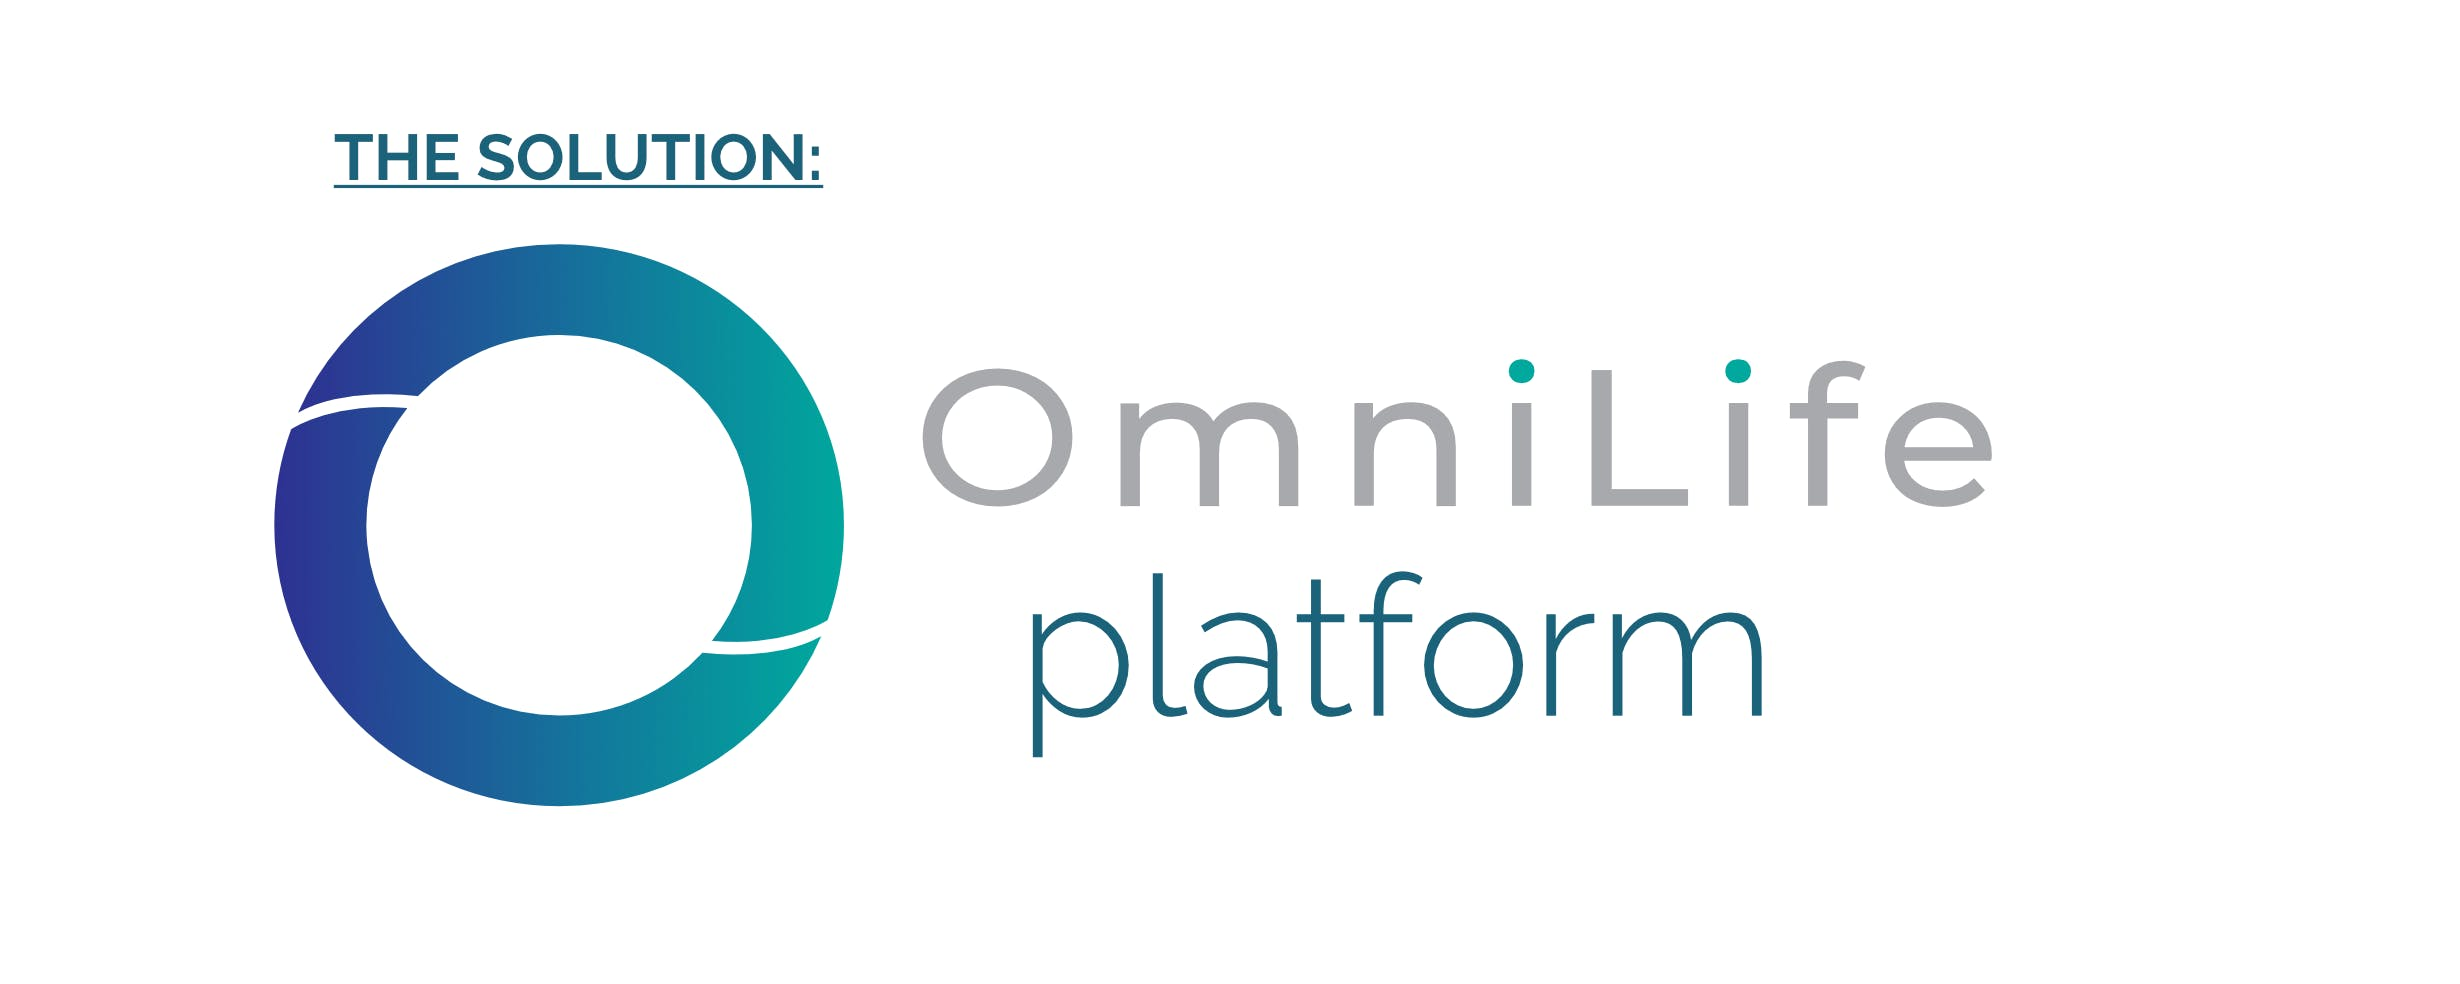 The solution omnilife platform